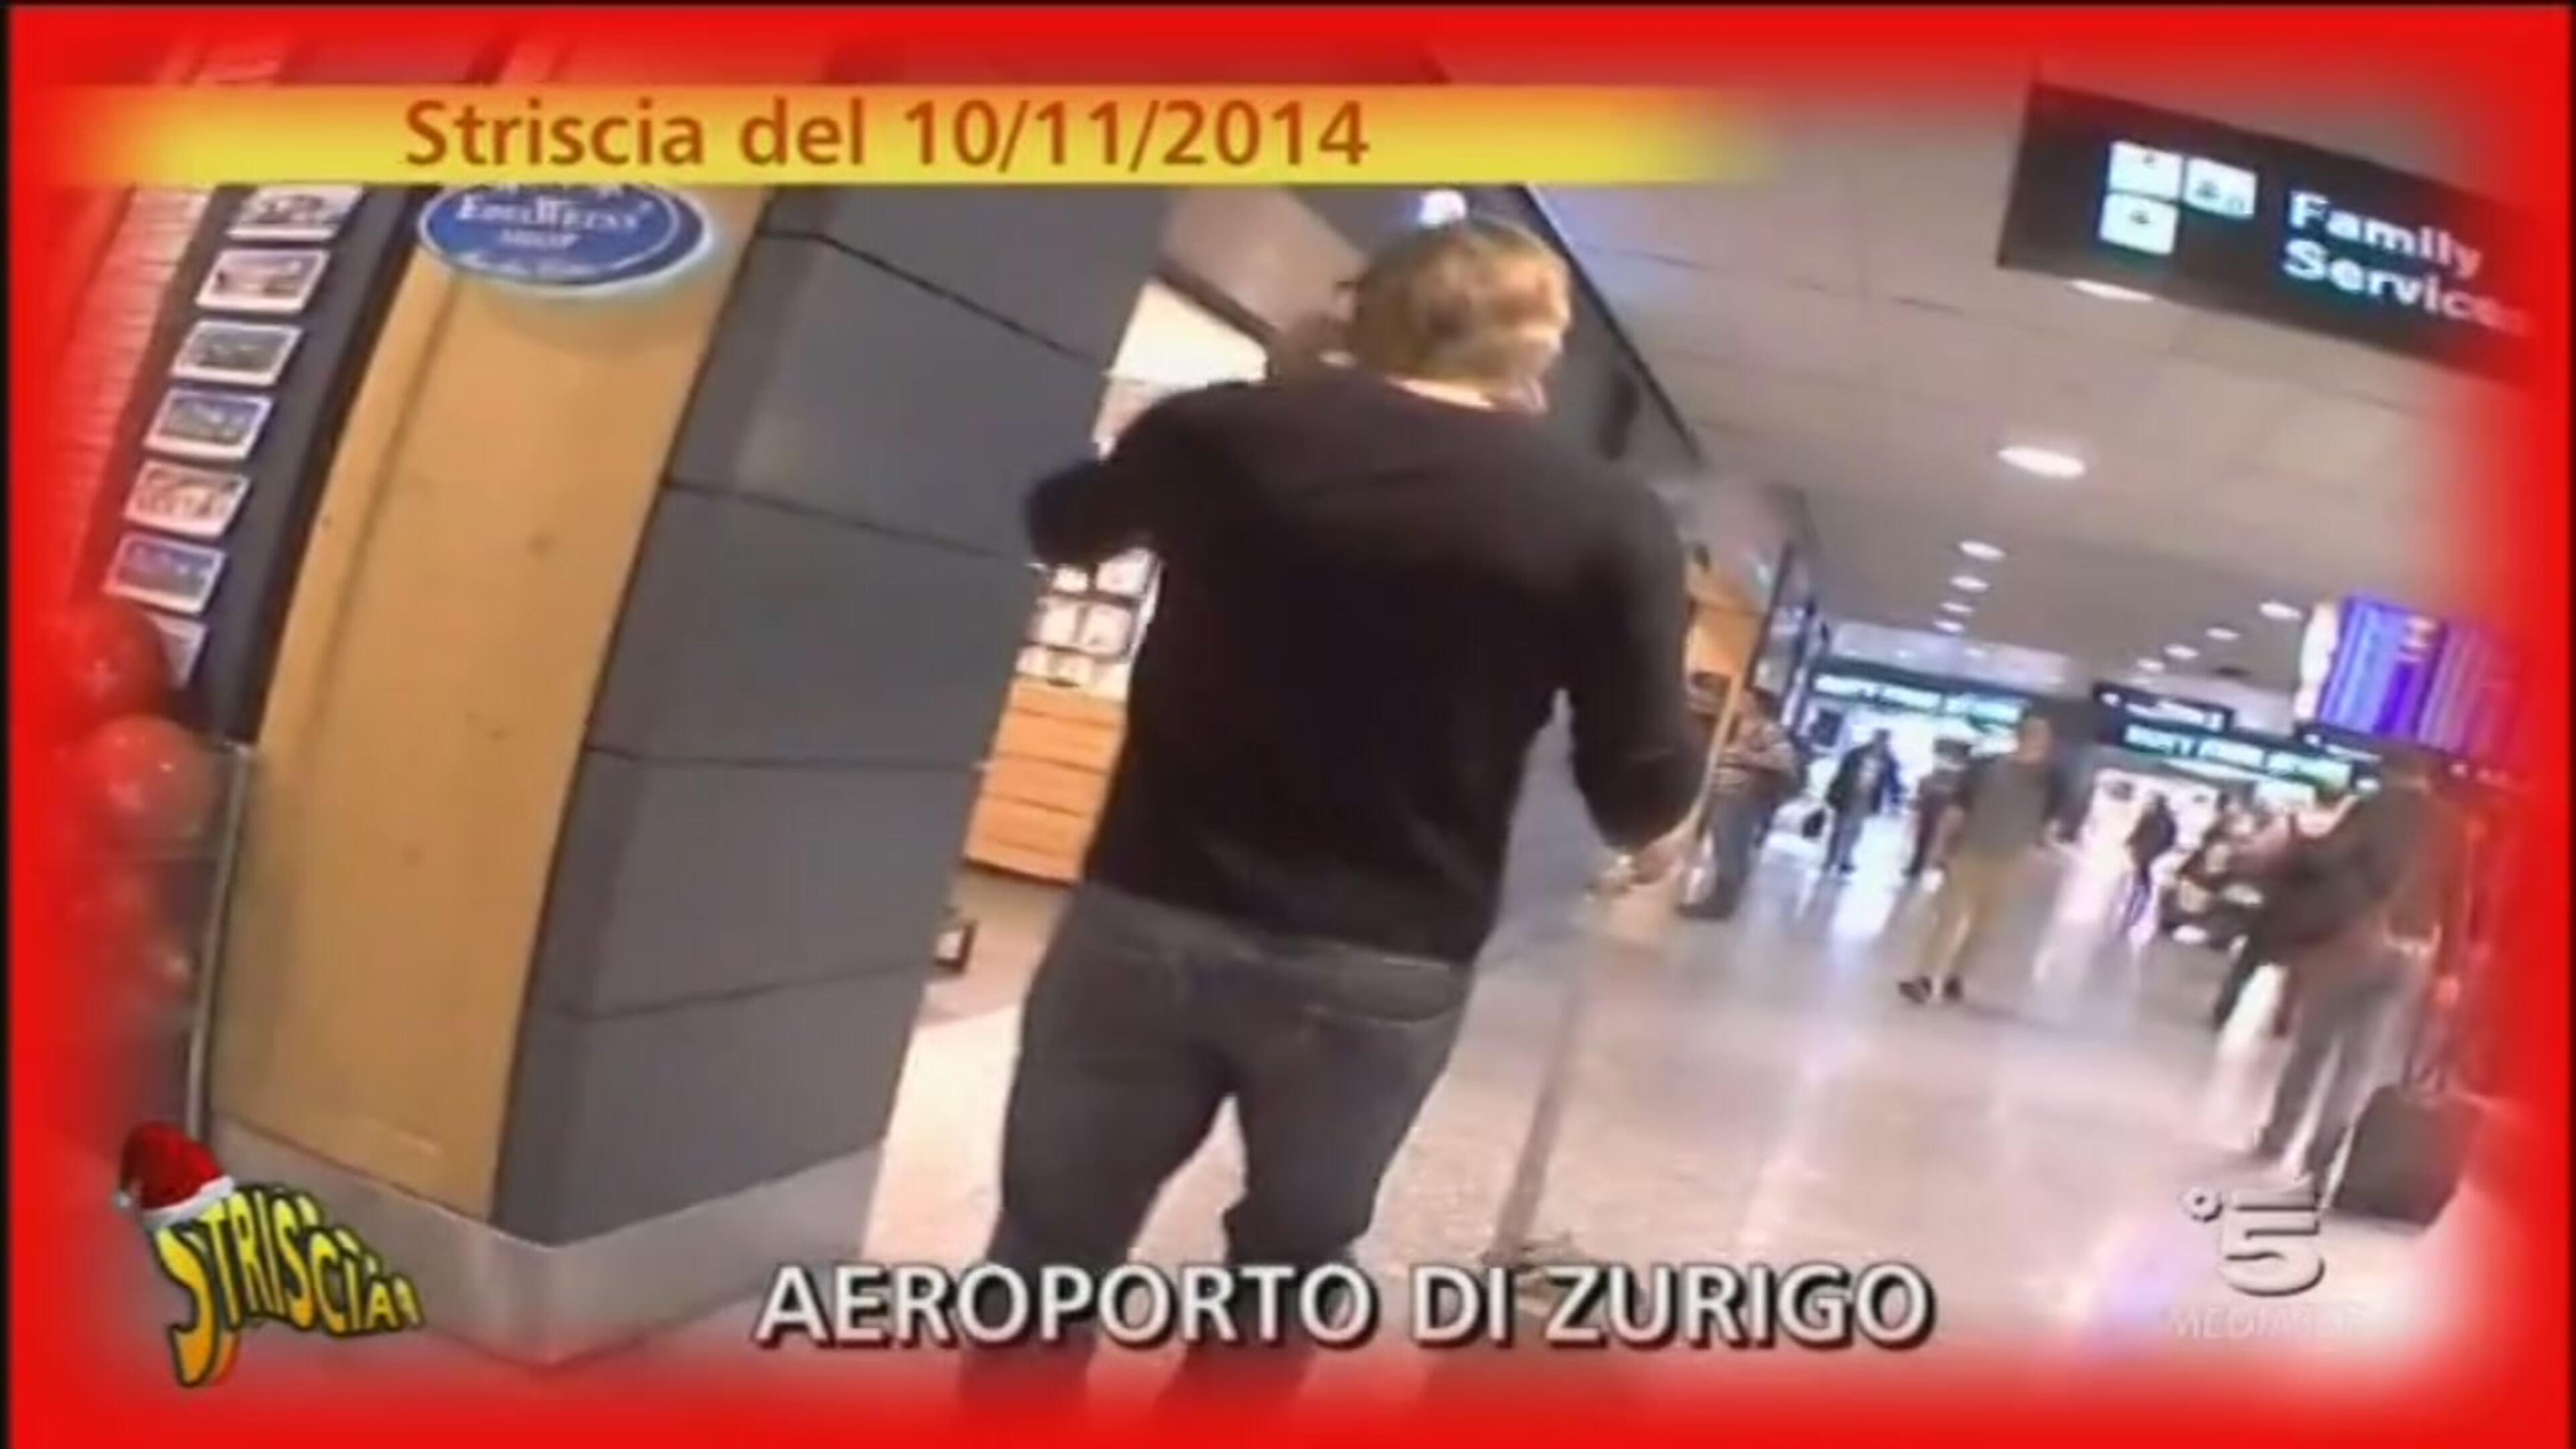 Aeroporti: lama, non lama - 2